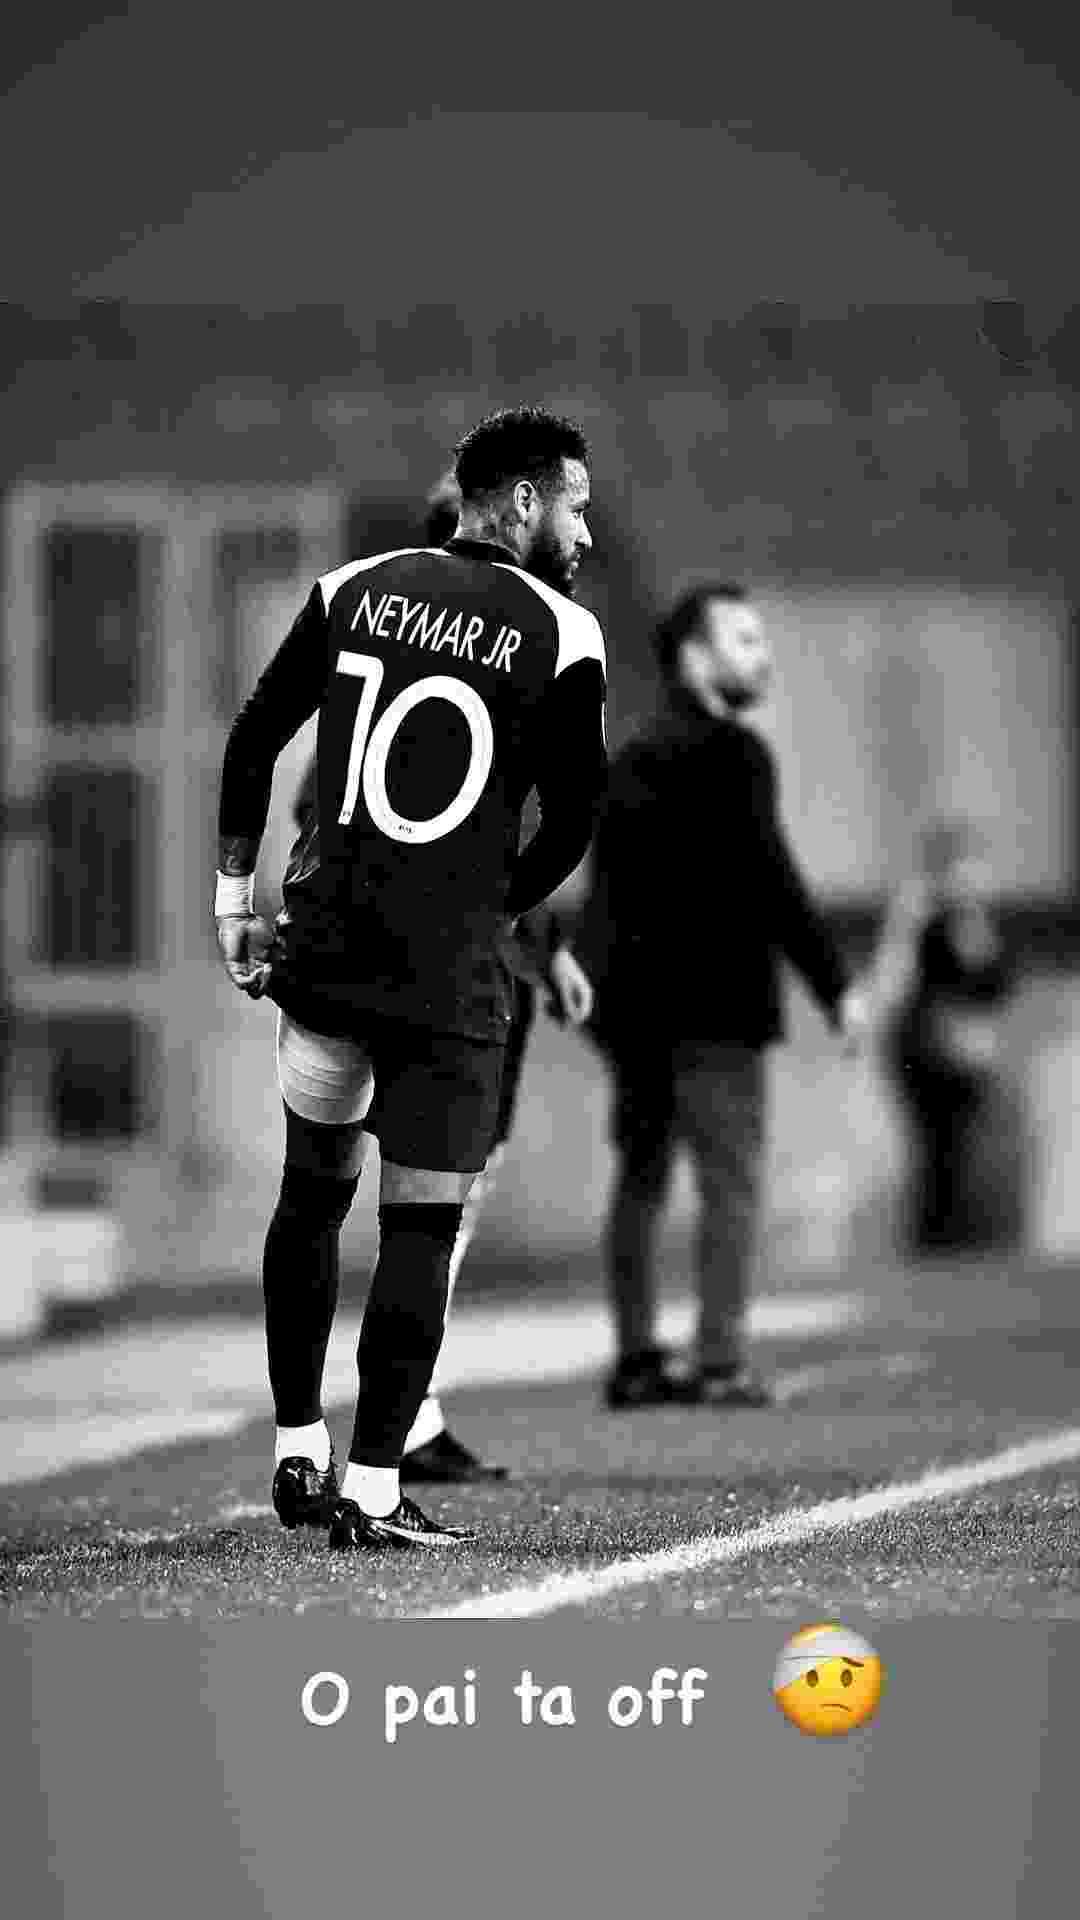 Neymar Jr lamenta lesão - undefined